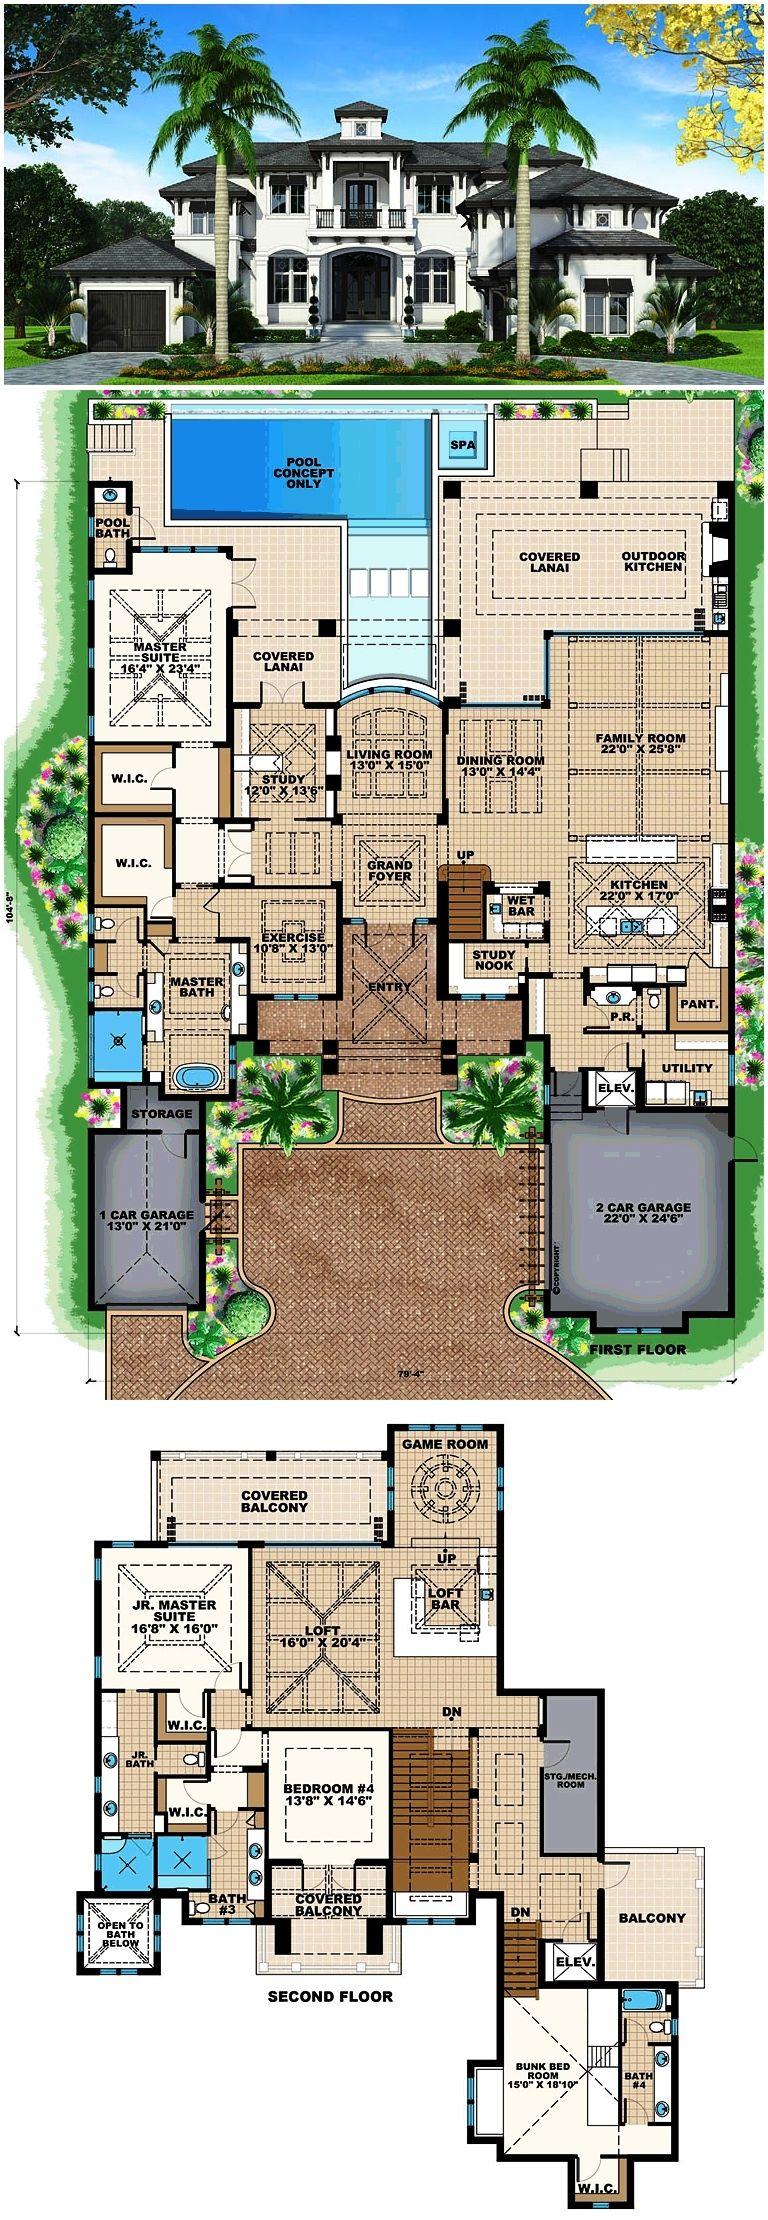 Mediterranean Style House Plan with 4 Bed 6 Bath 3 Car Garage